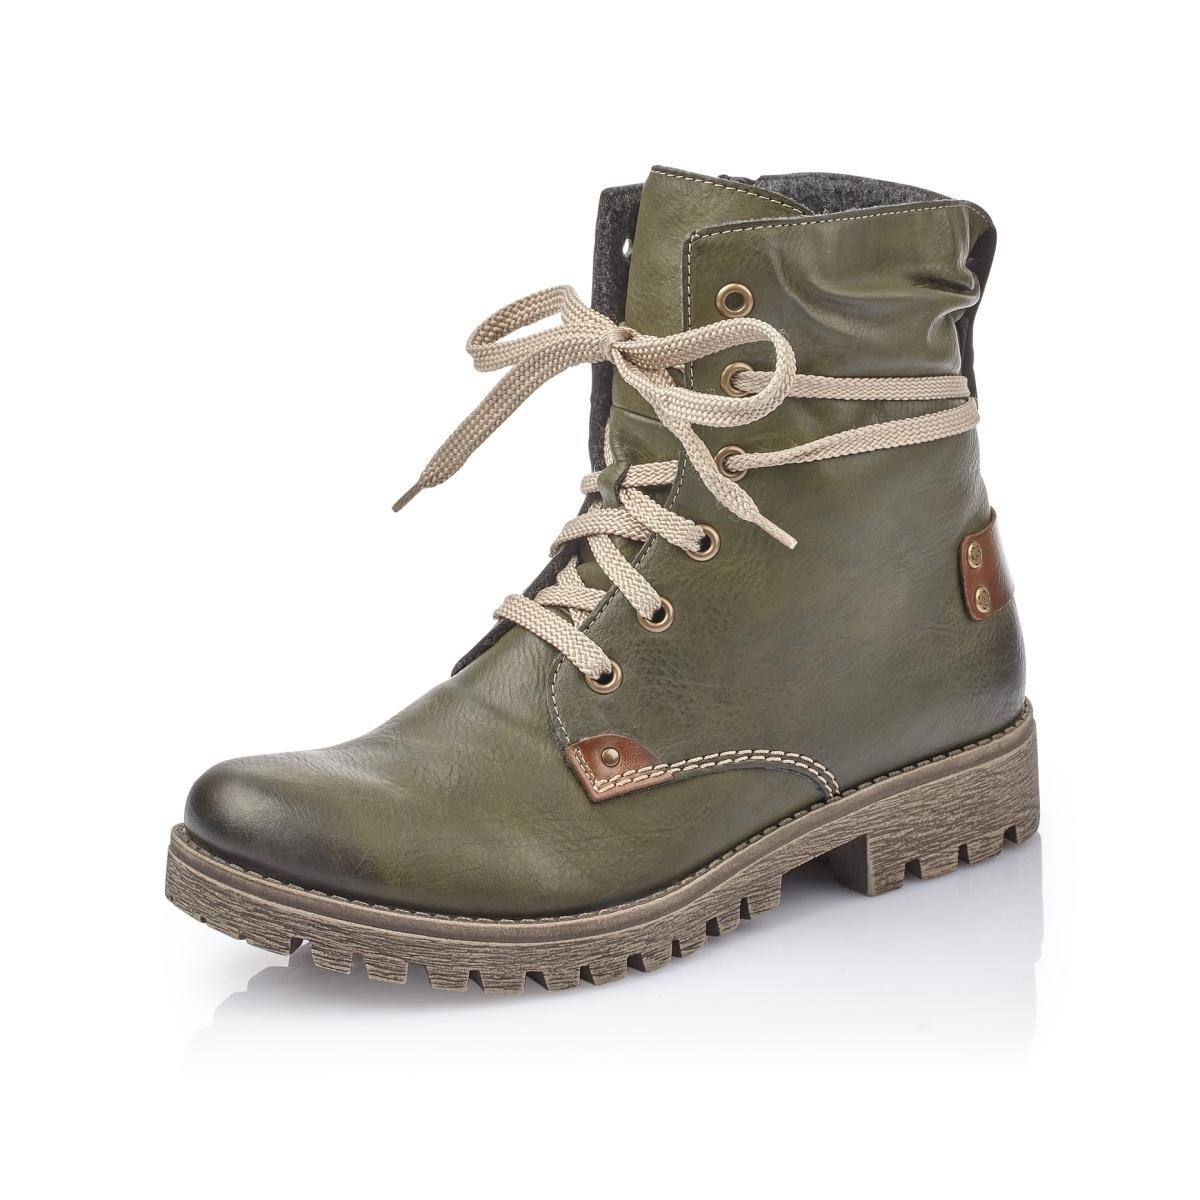 720868a055 detail Dámská obuv RIEKER 78530 52 GRÜN H W 8